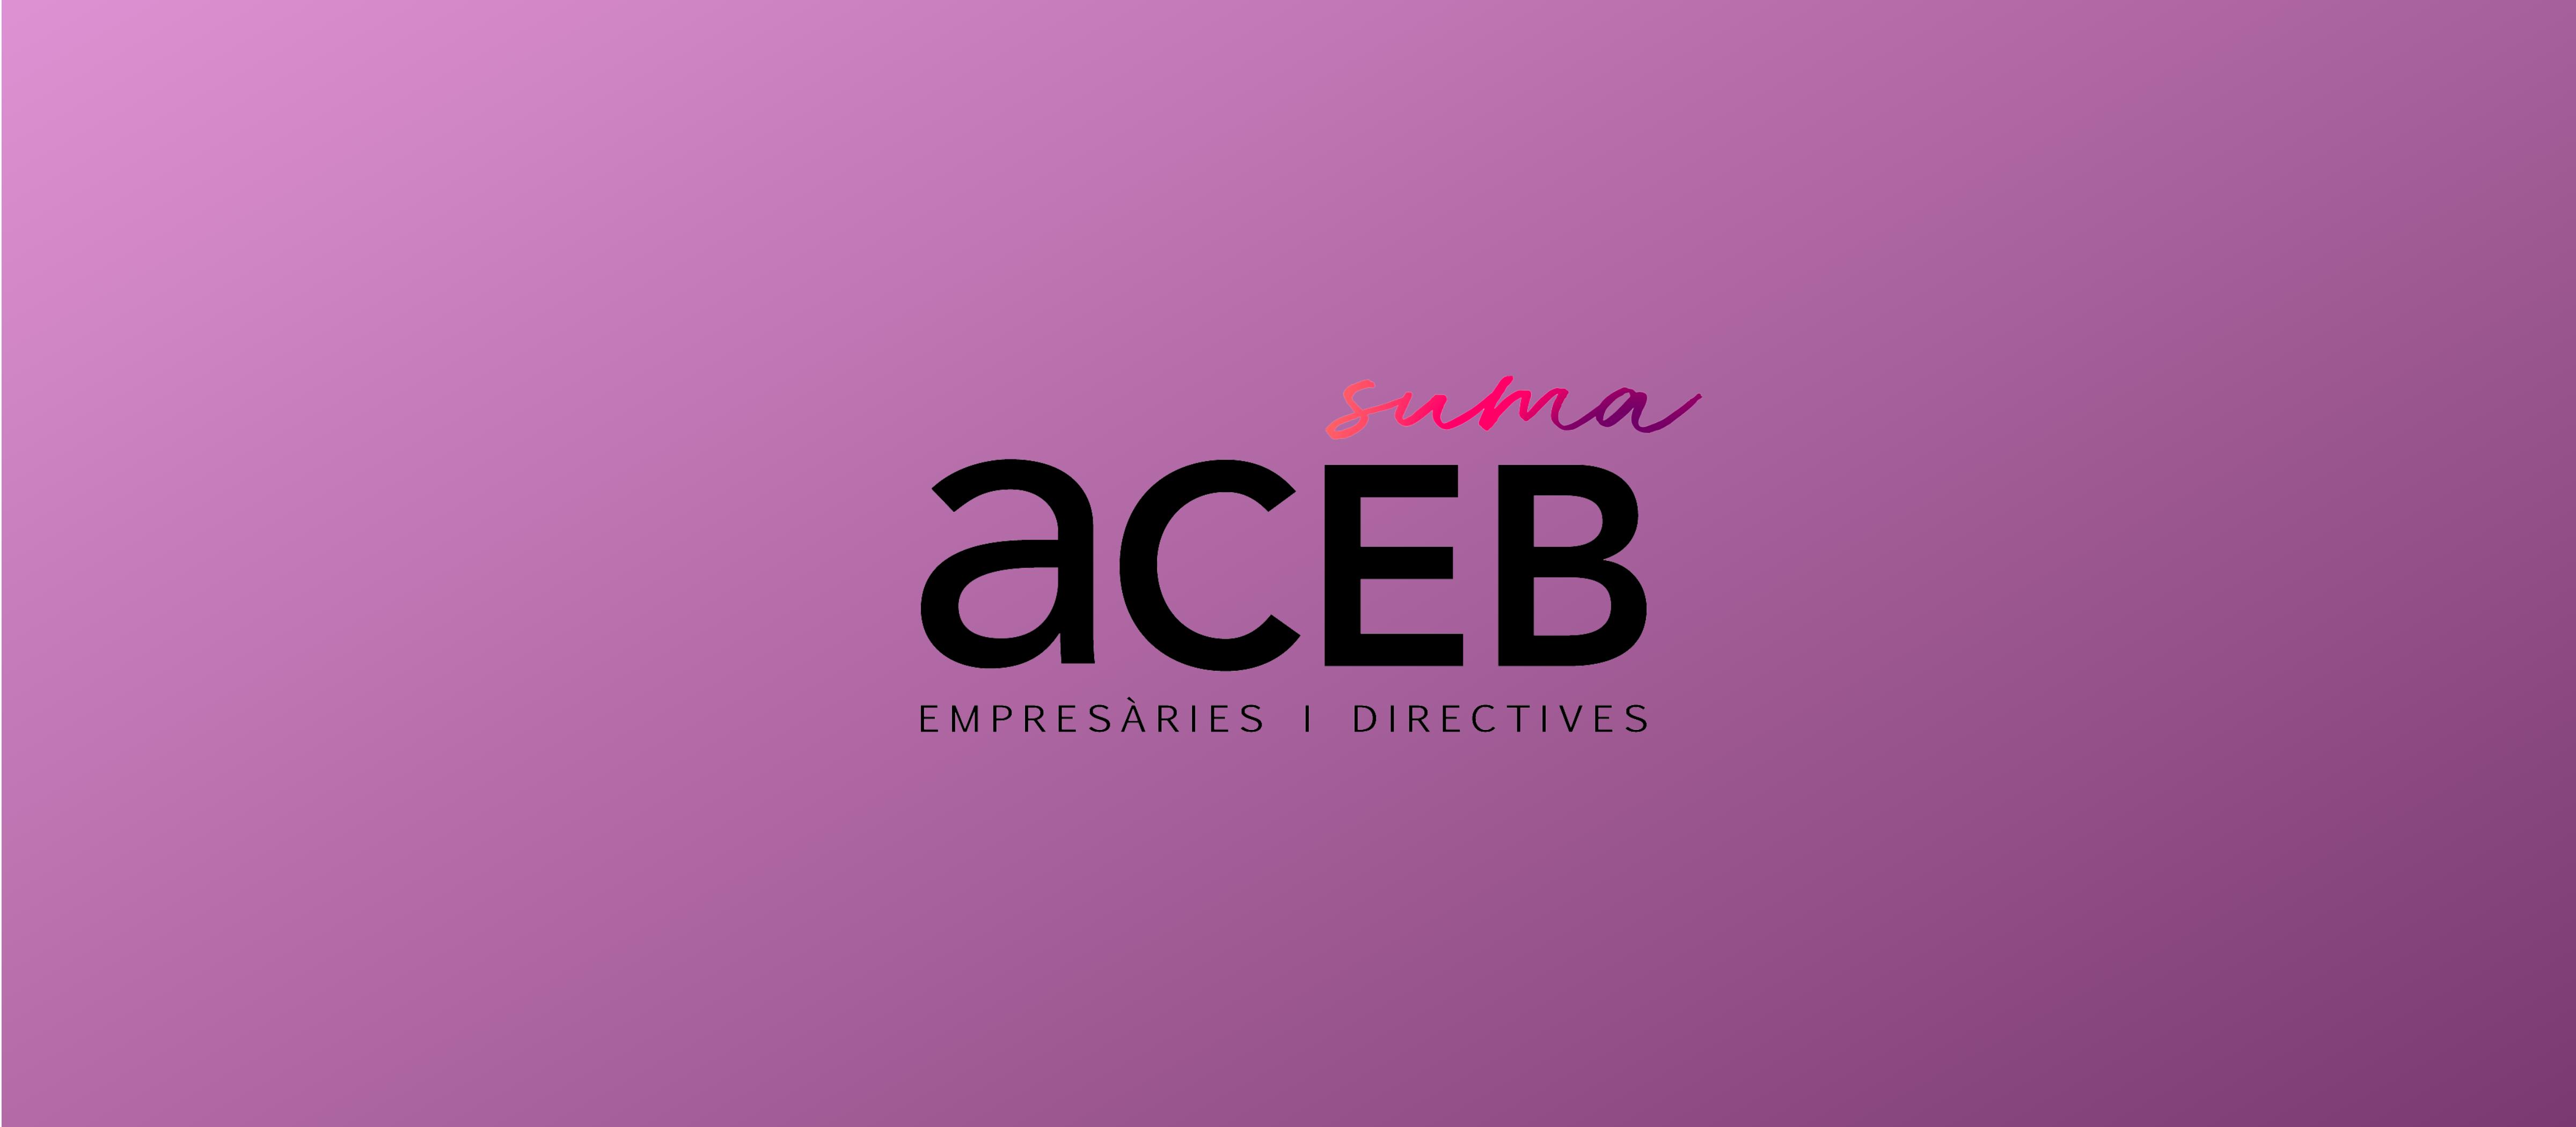 Capeleres_WEB-_ACEBsuma